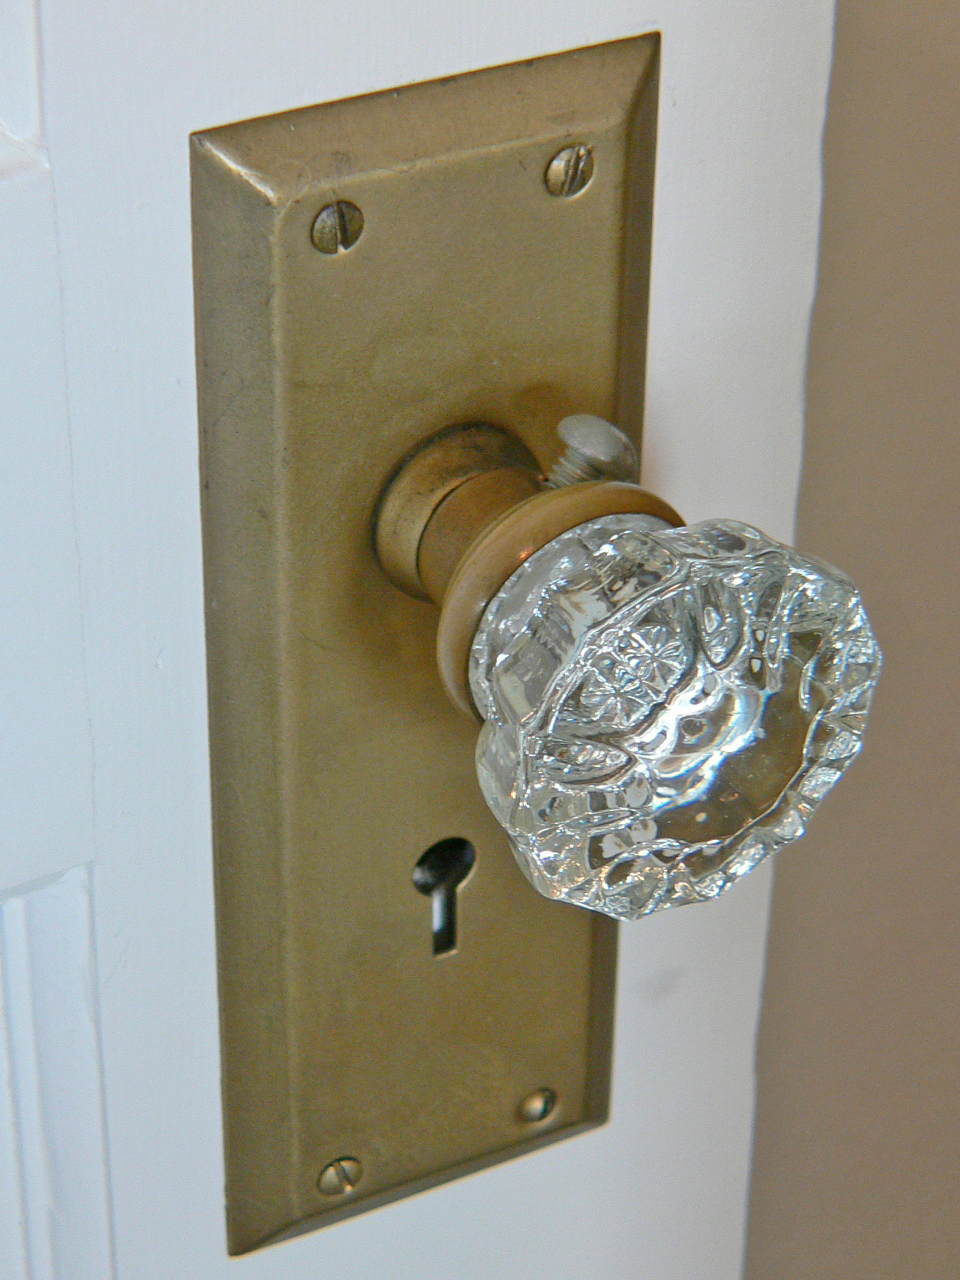 An original glass door knob.